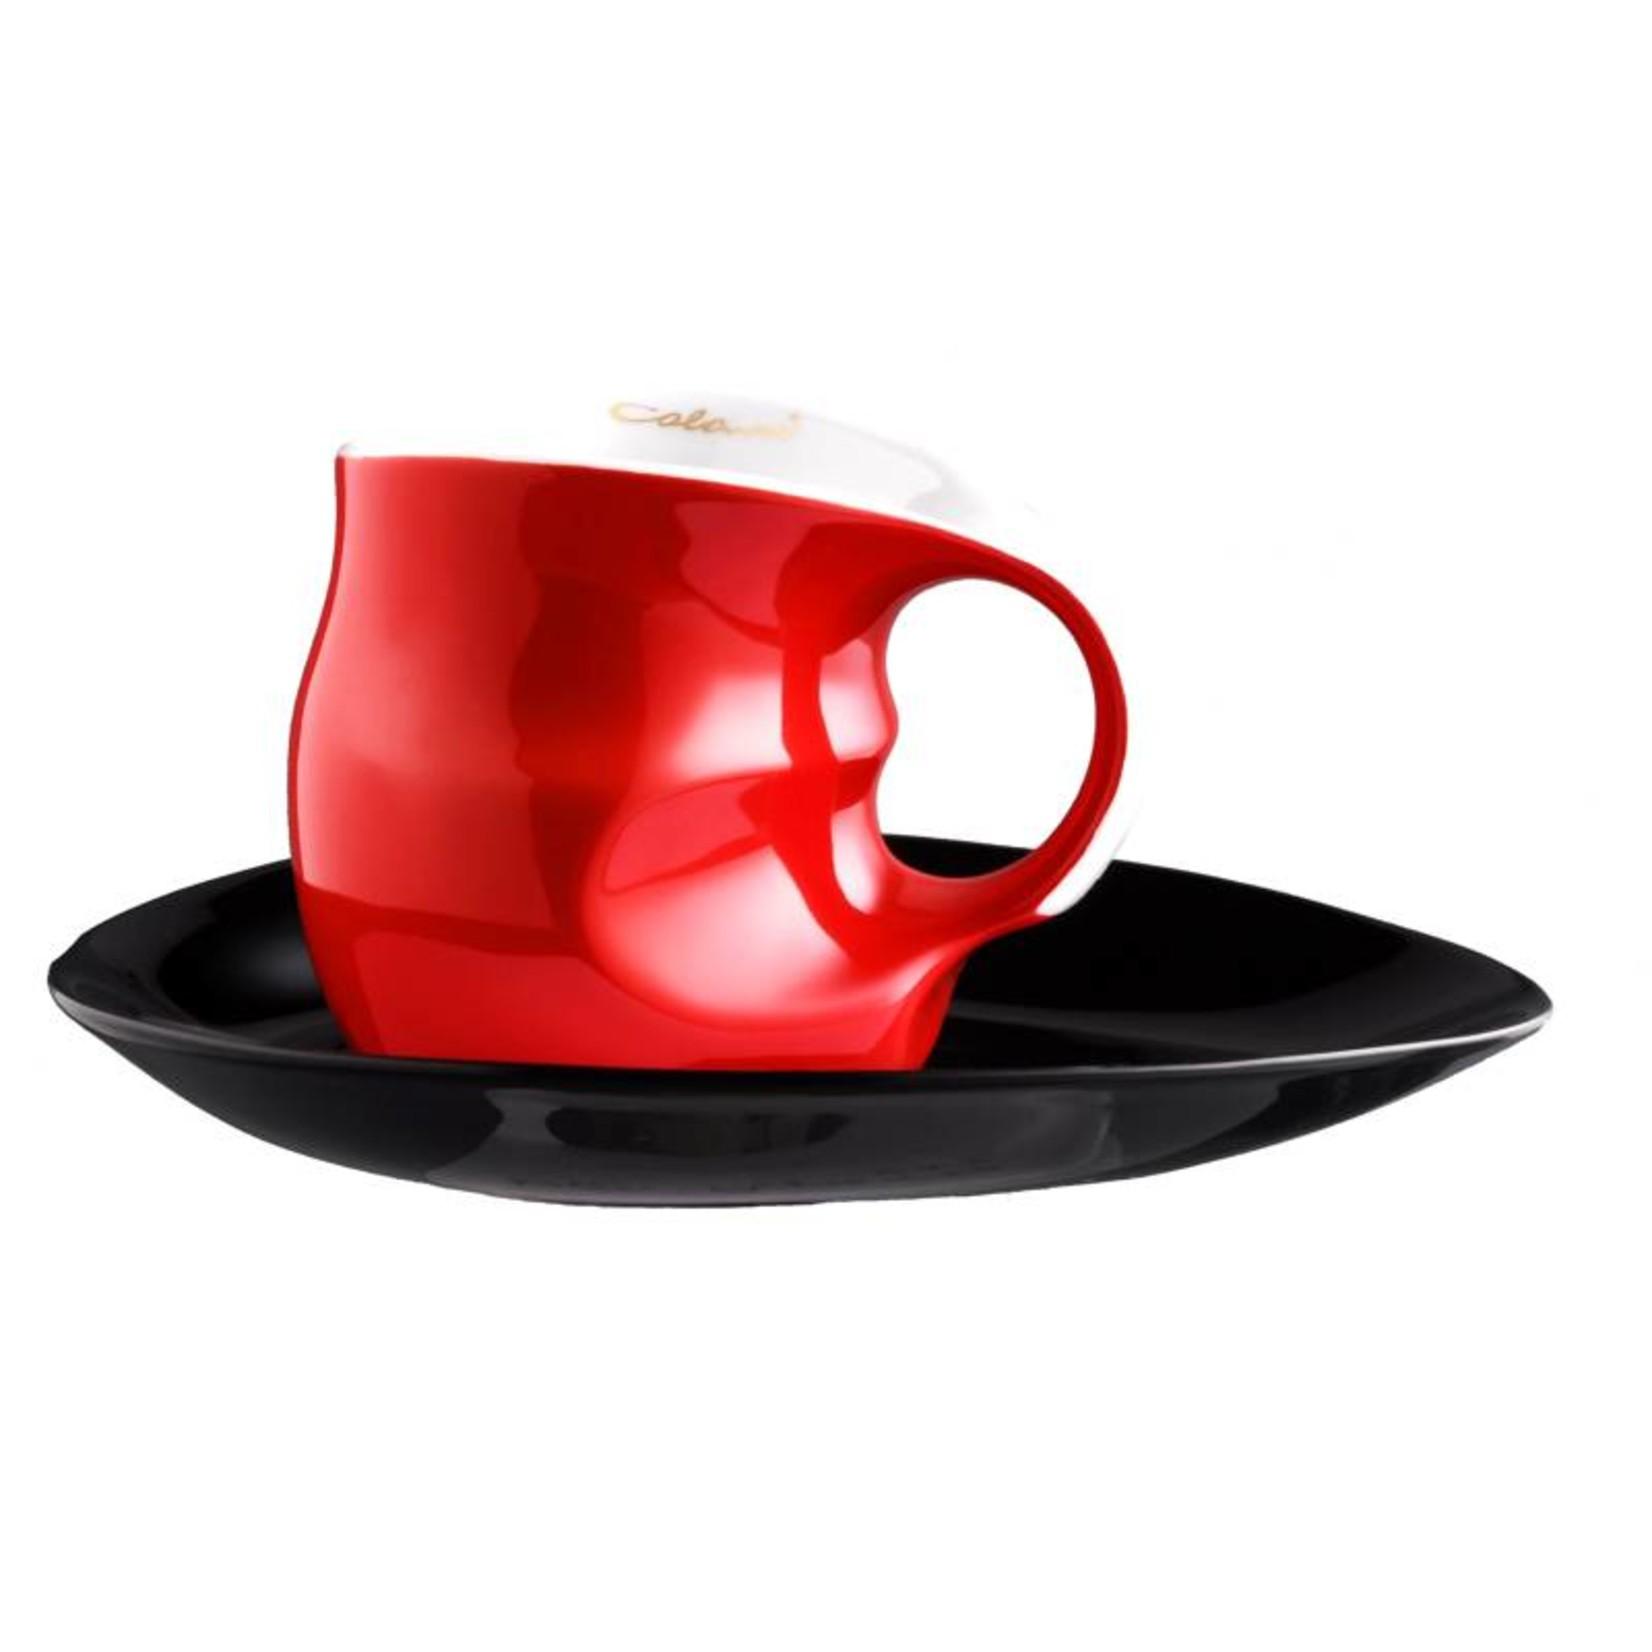 Colani Porzellanserie Colani Kaffee-/Cappuccinotasse | Tasse inkl. Unterteller | rot